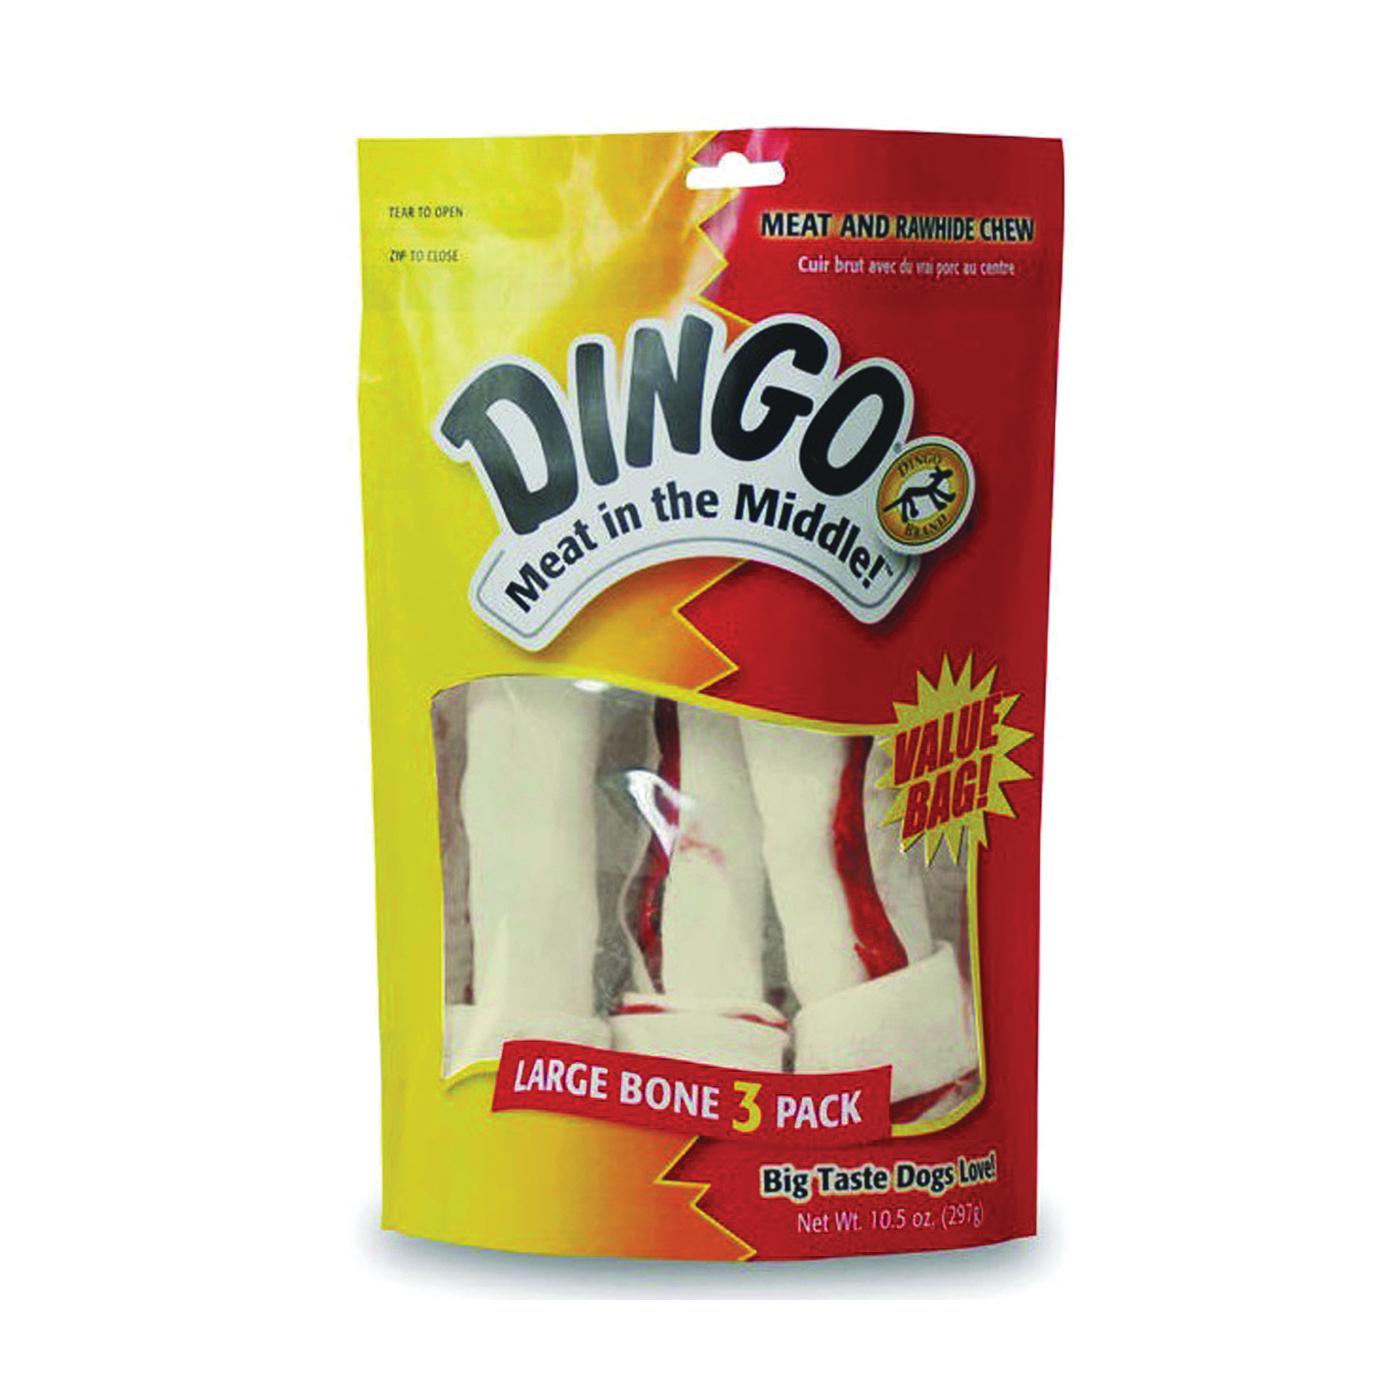 Picture of Dingo P-95008 Dog Bone 10.5 oz, 10.5 oz Package